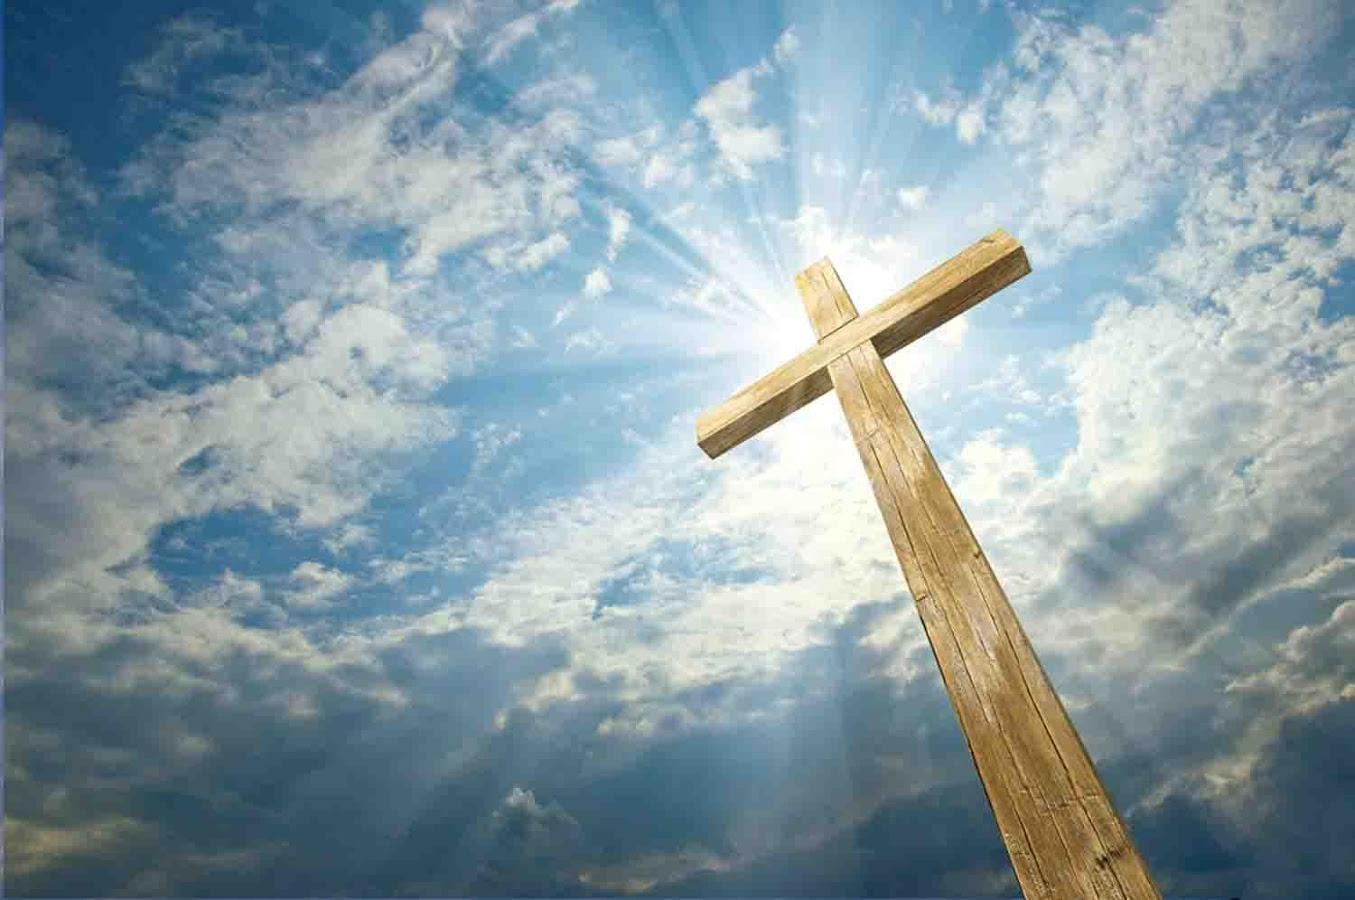 Cross image hd wallpaper st stephens church elton voltagebd Choice Image